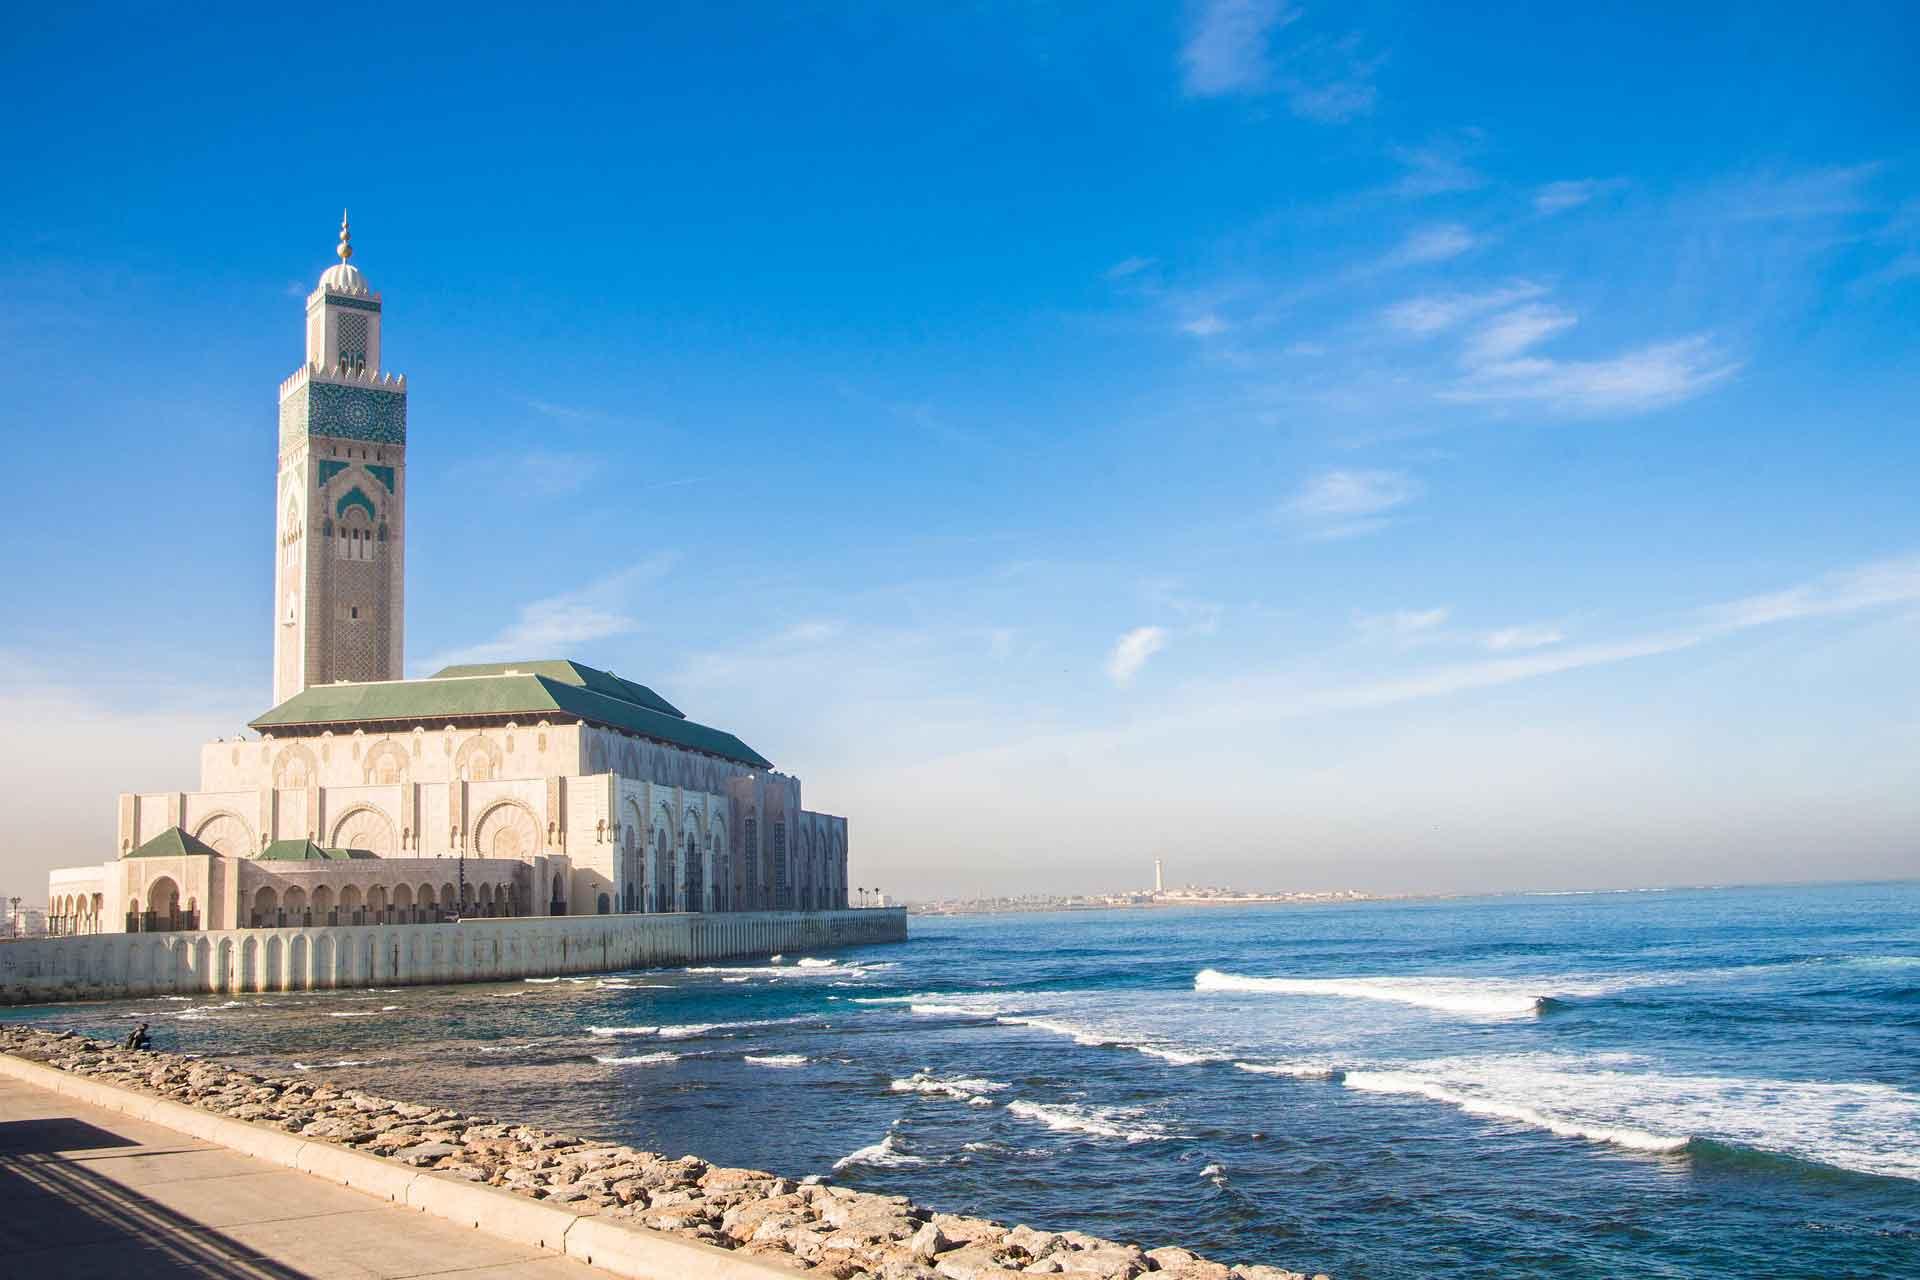 Urlaub in Marokko: Hier das Meer bei Casablanca